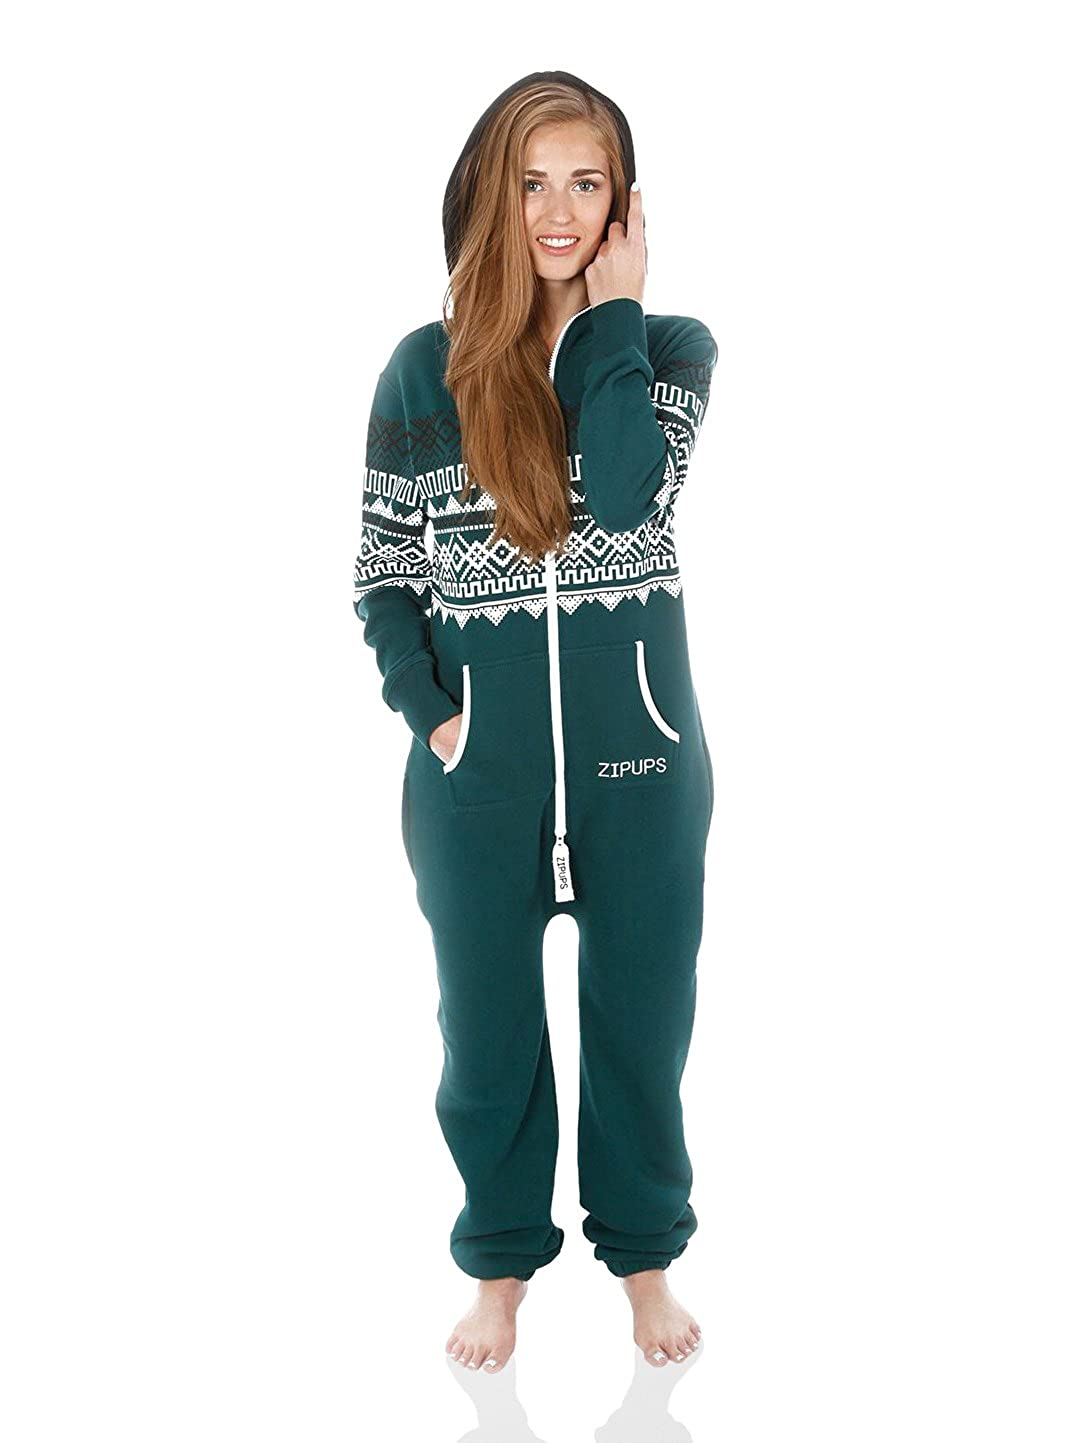 Zipups Mono-Pijama Scandinavia Verde Oscuro XS: Amazon.es: Ropa y accesorios